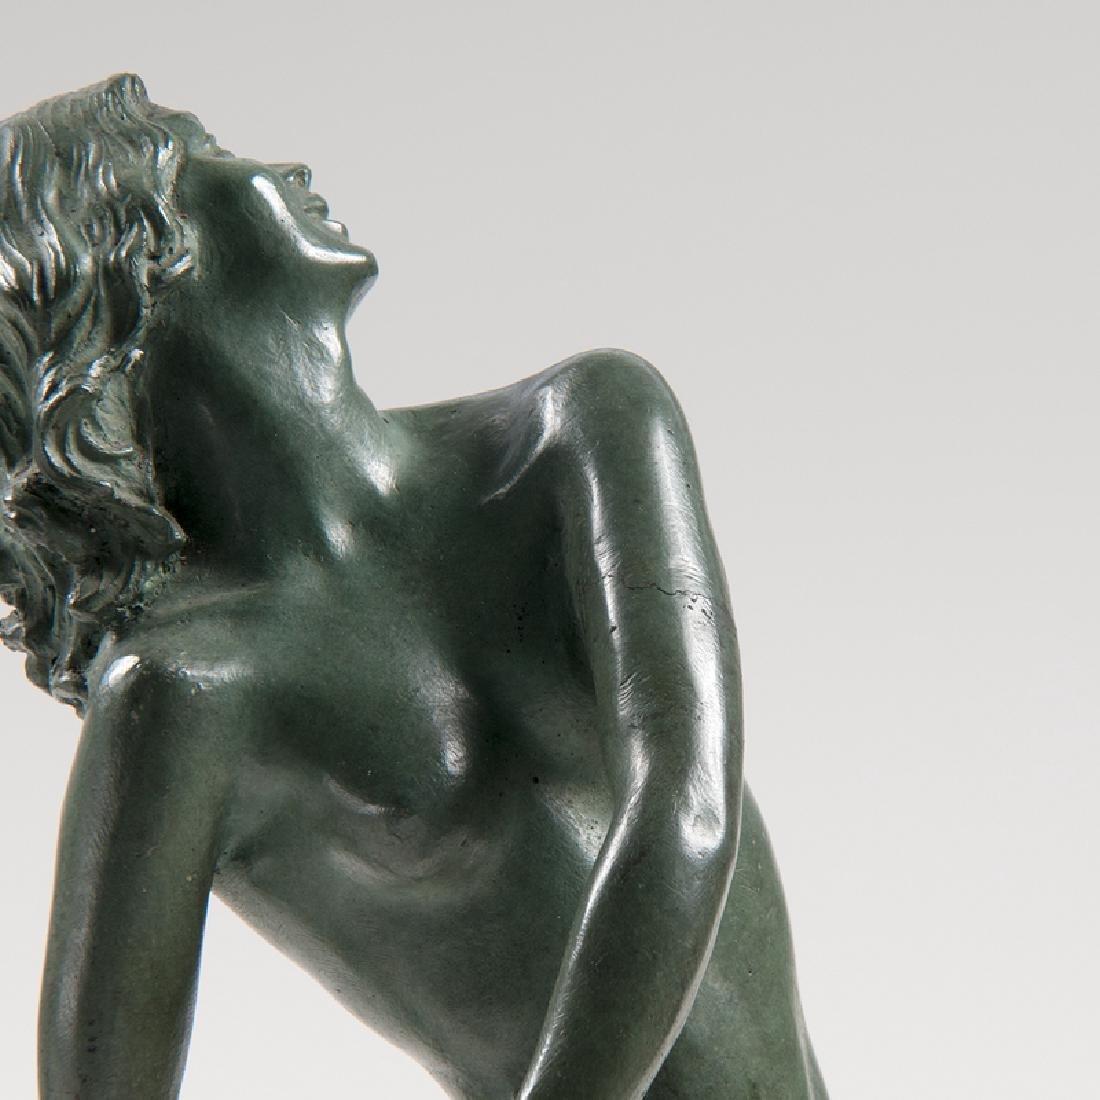 Harriet Whitney Frishmuth (American, 1880-1980) Bronze - 7